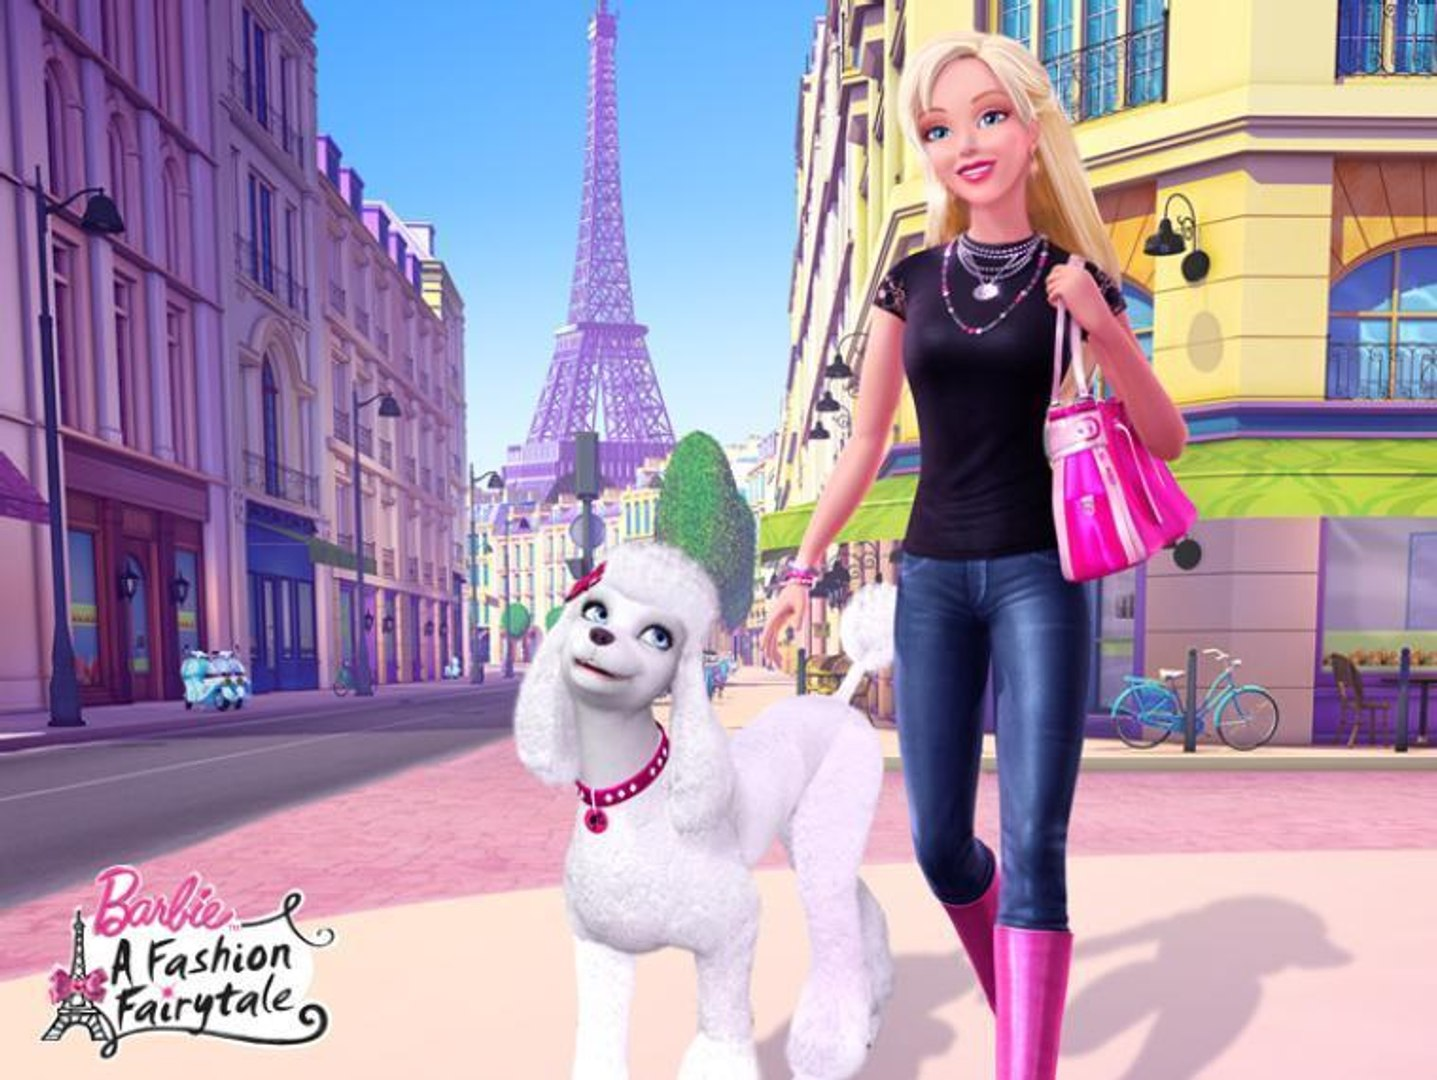 Barbie A Fashion Fairytale Complite Video Part Ii Video Dailymotion